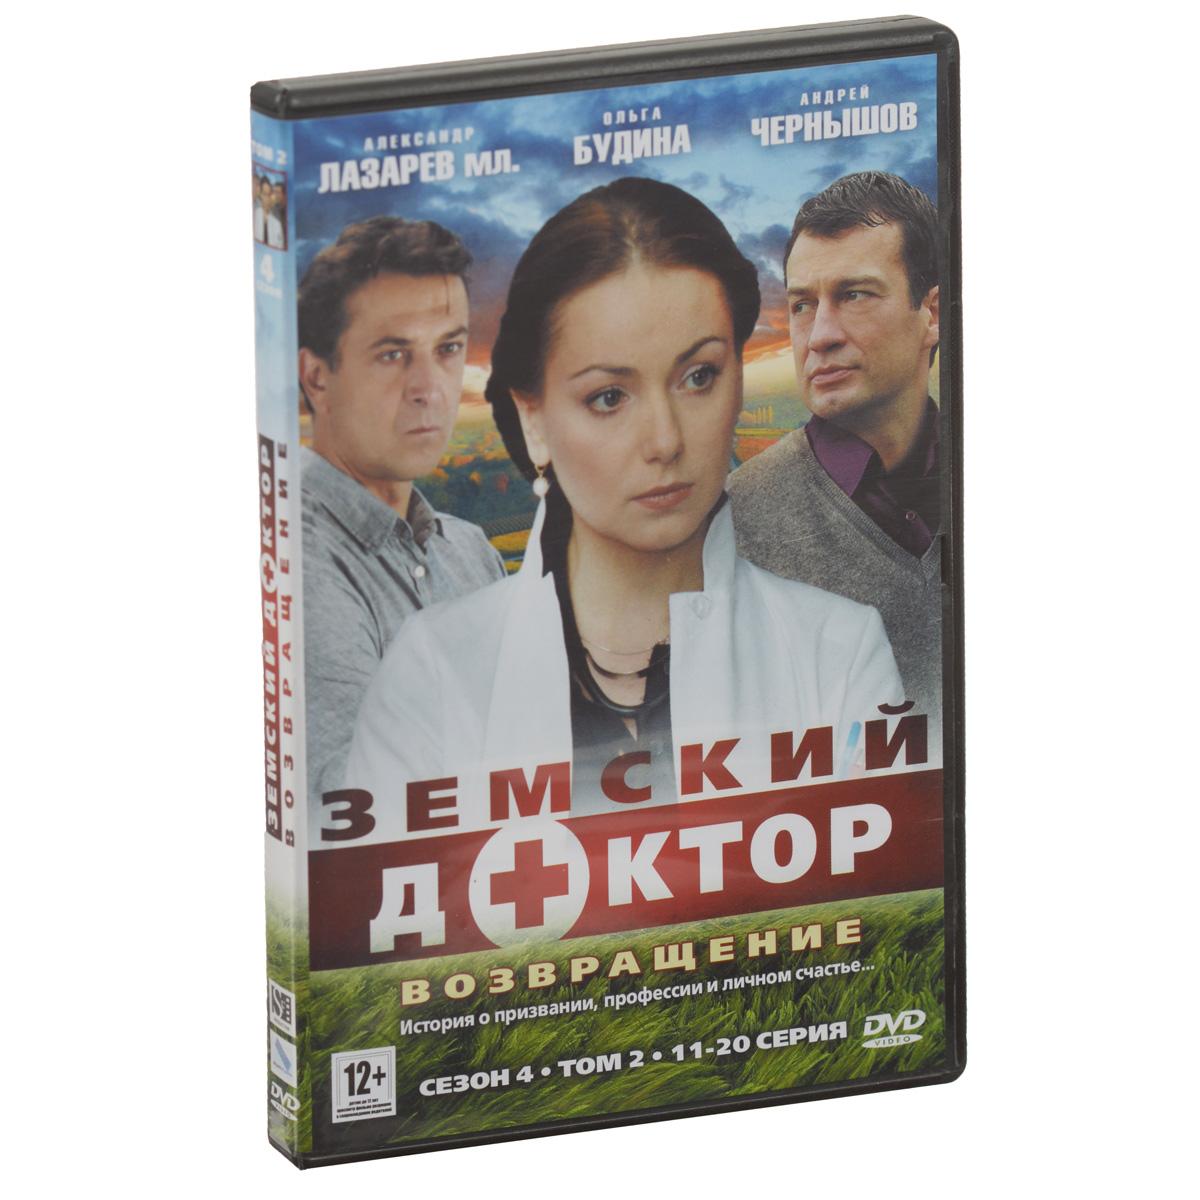 Земский доктор: Возвращение, Серии 11-20